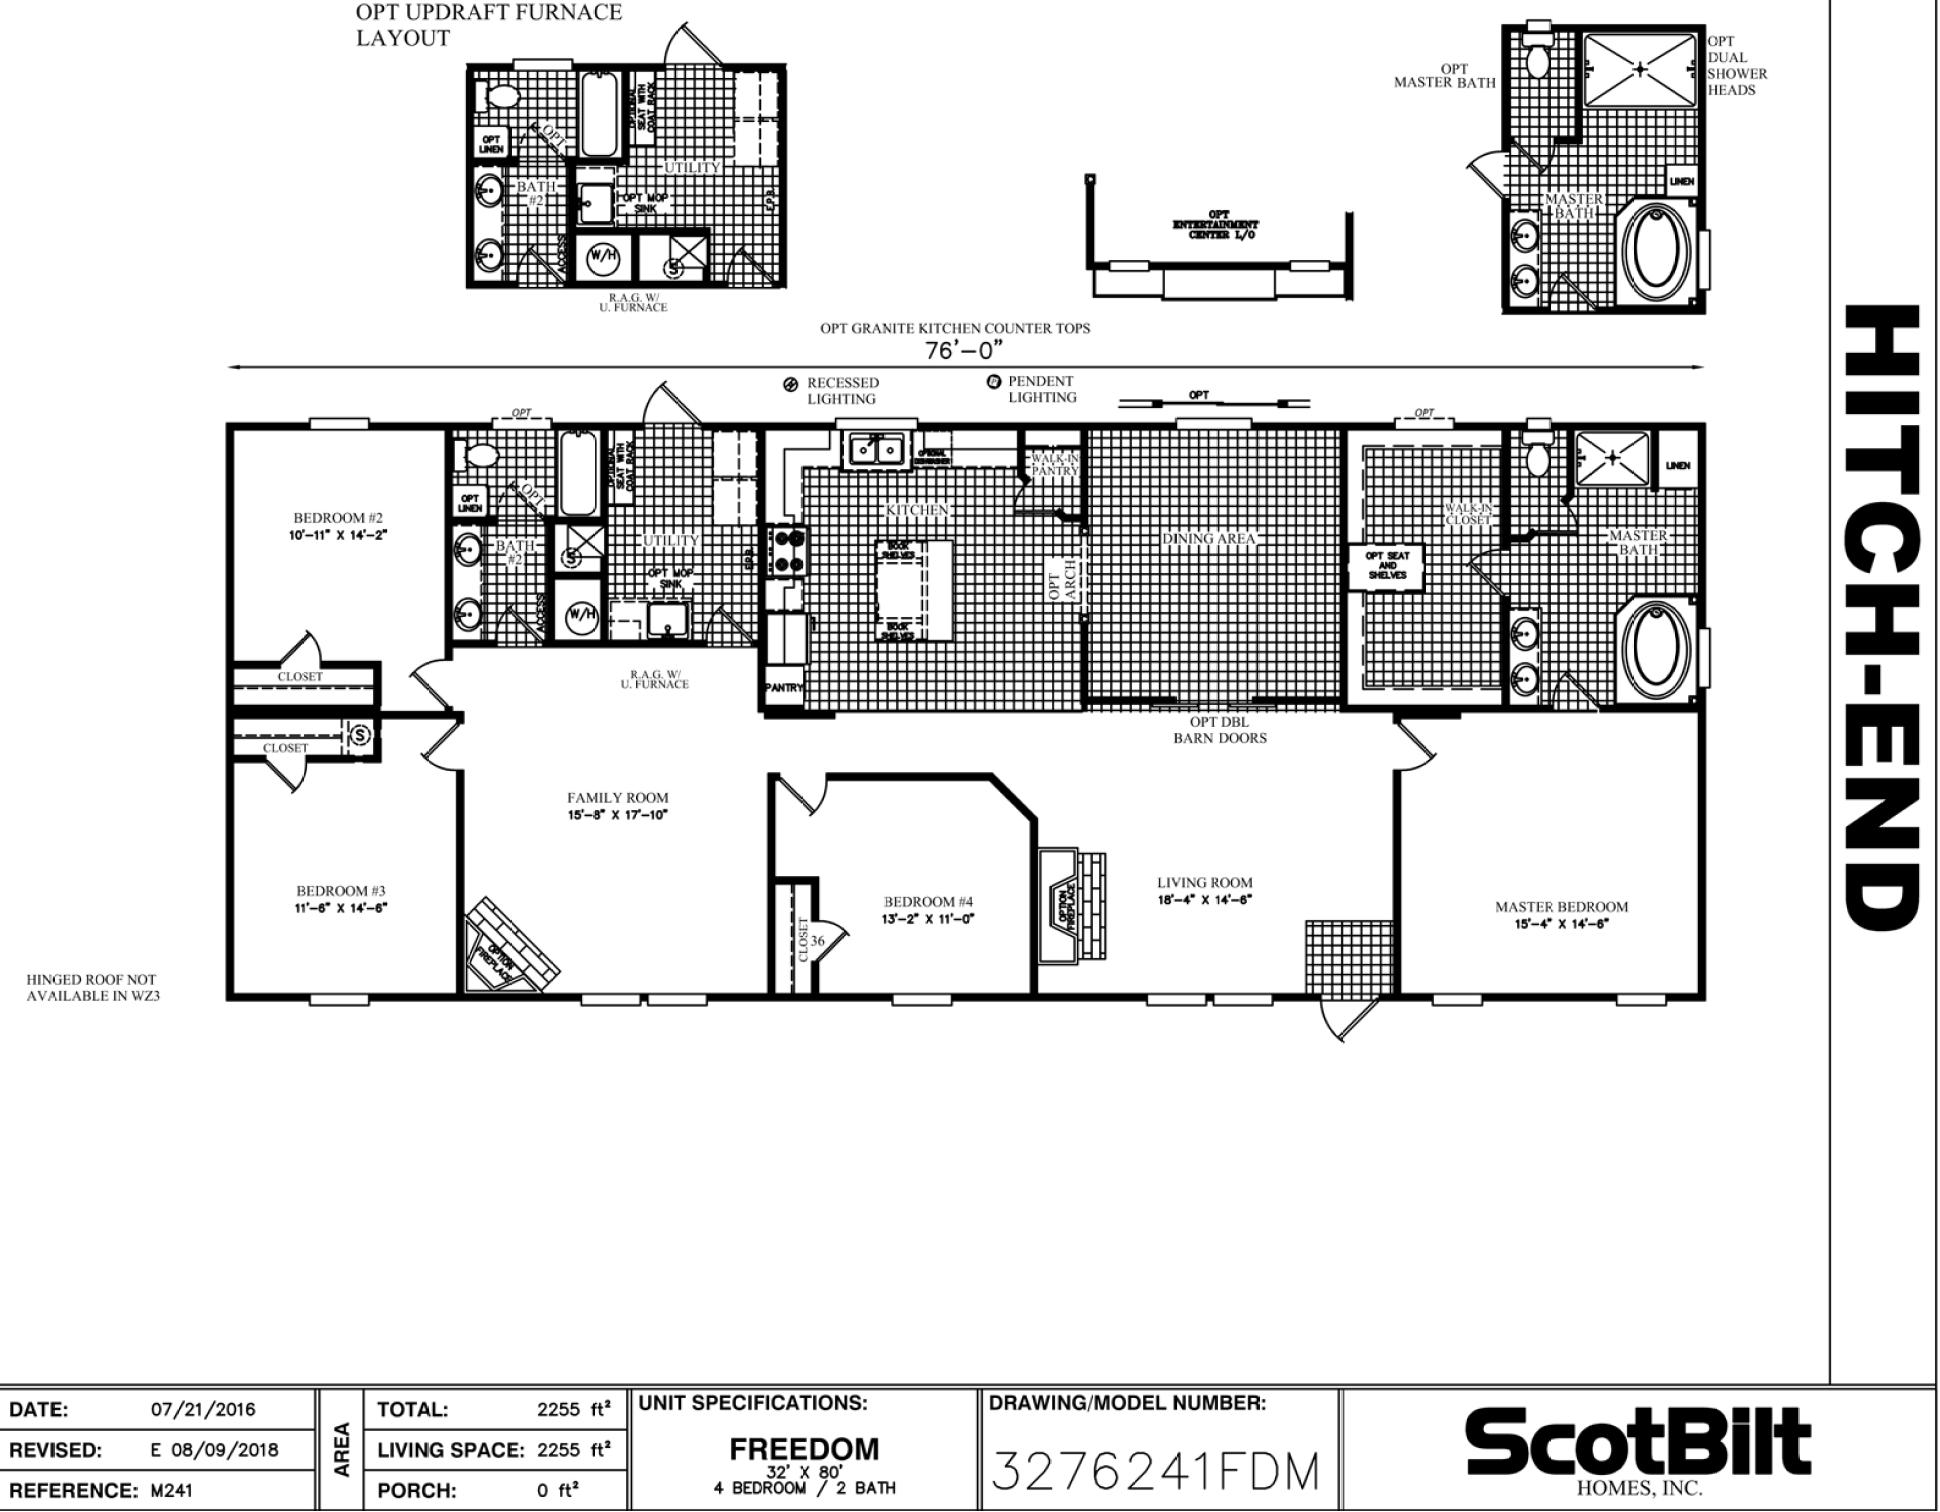 Freedom 3276241 | Scotbilt